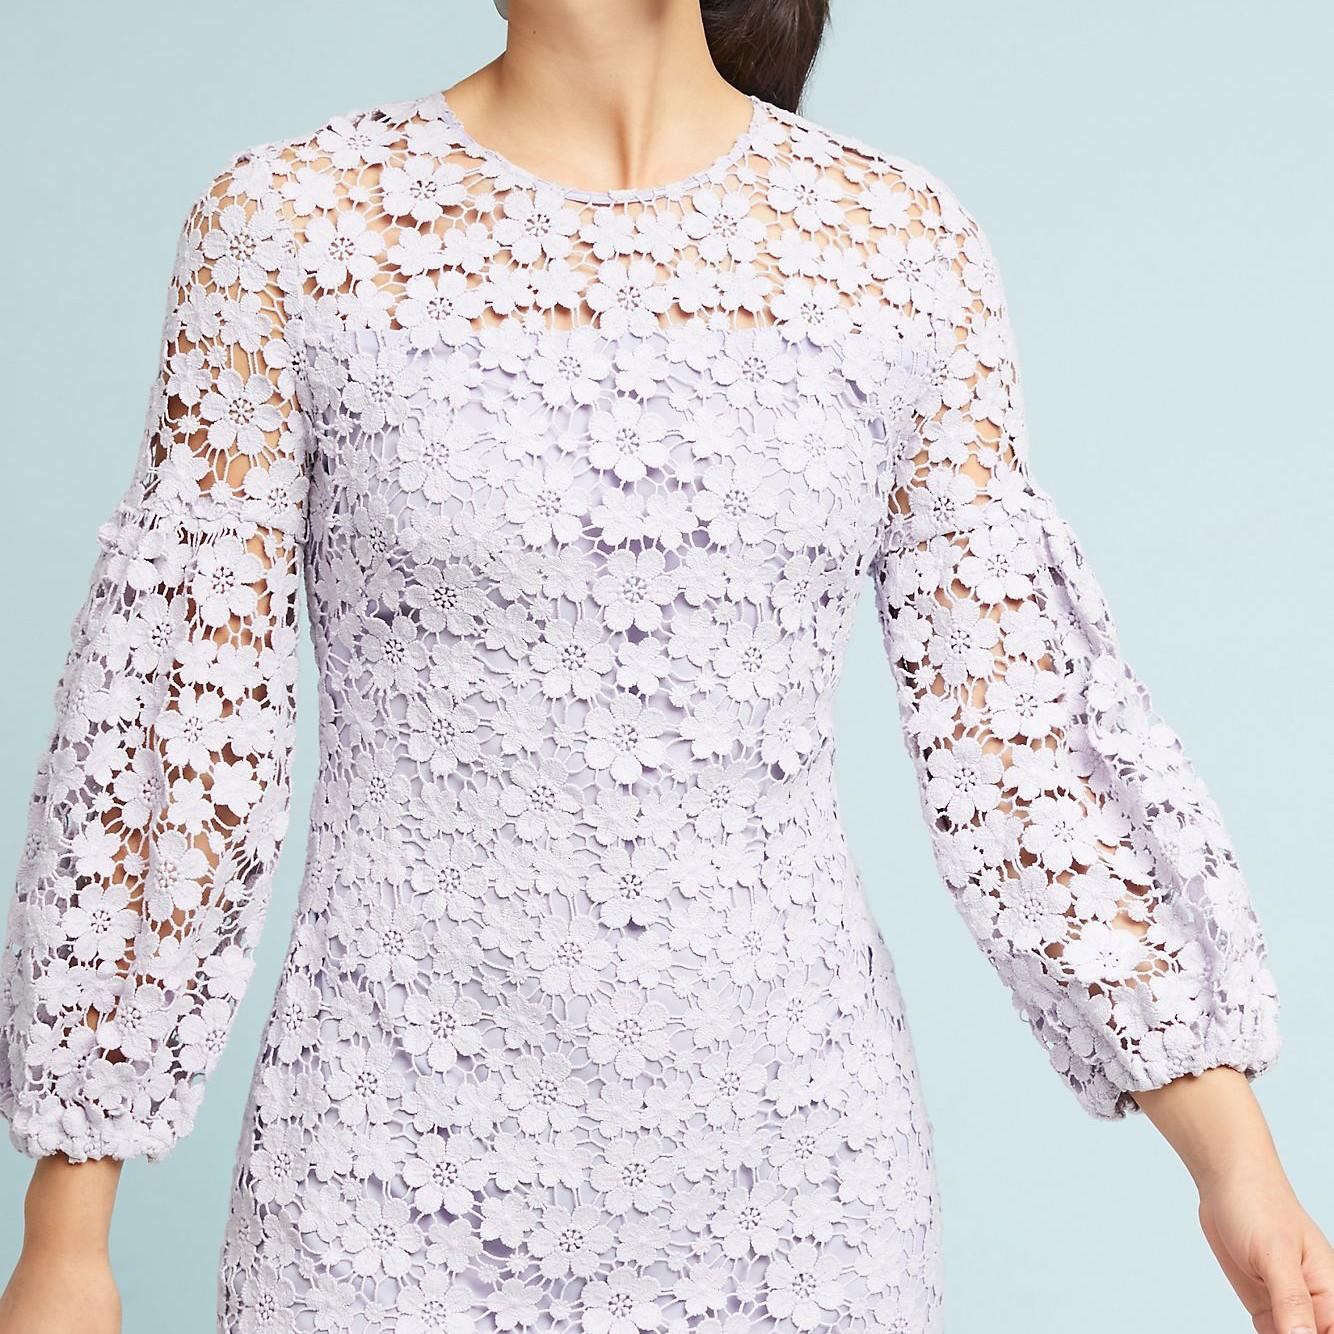 Shoshanna Vina Lace Lavender Dress